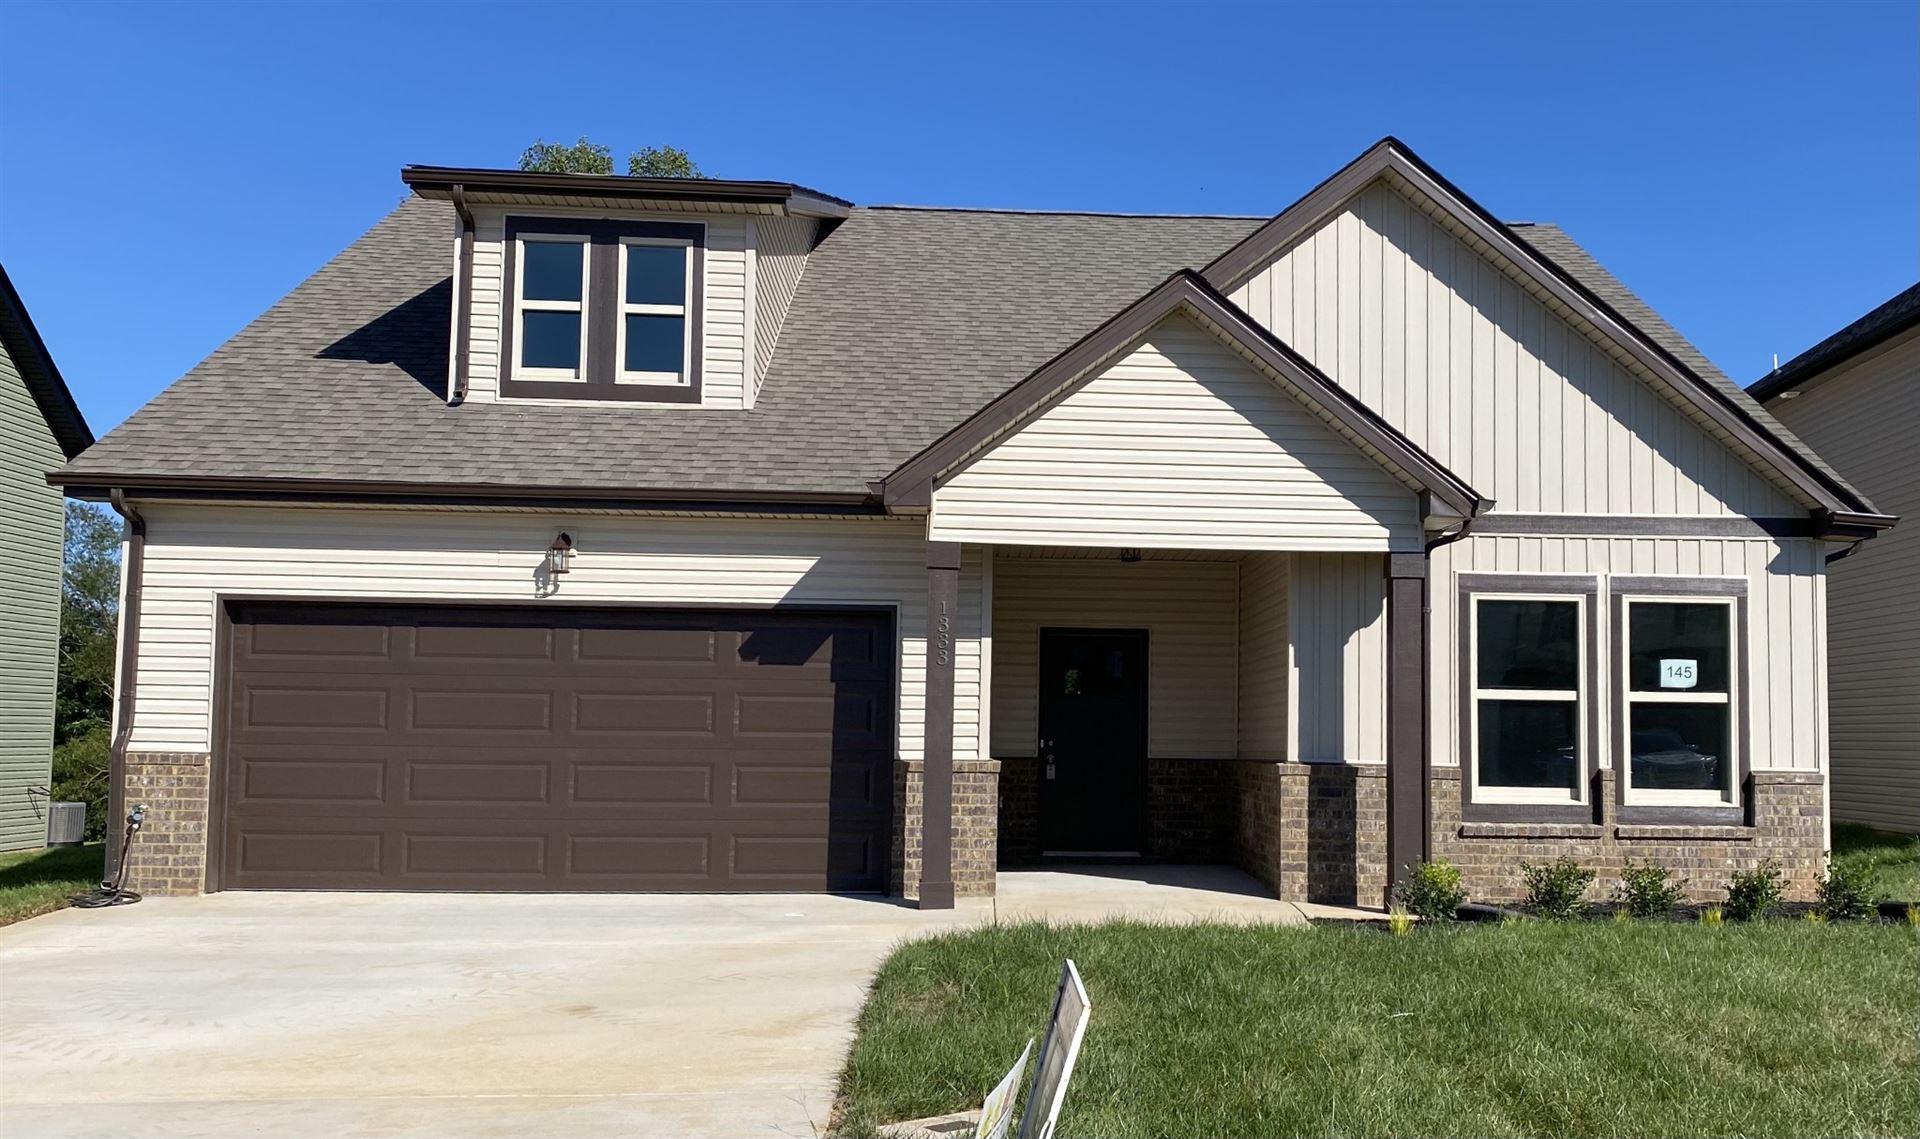 145 Mills Creek, Clarksville, TN 37042 - MLS#: 2262841